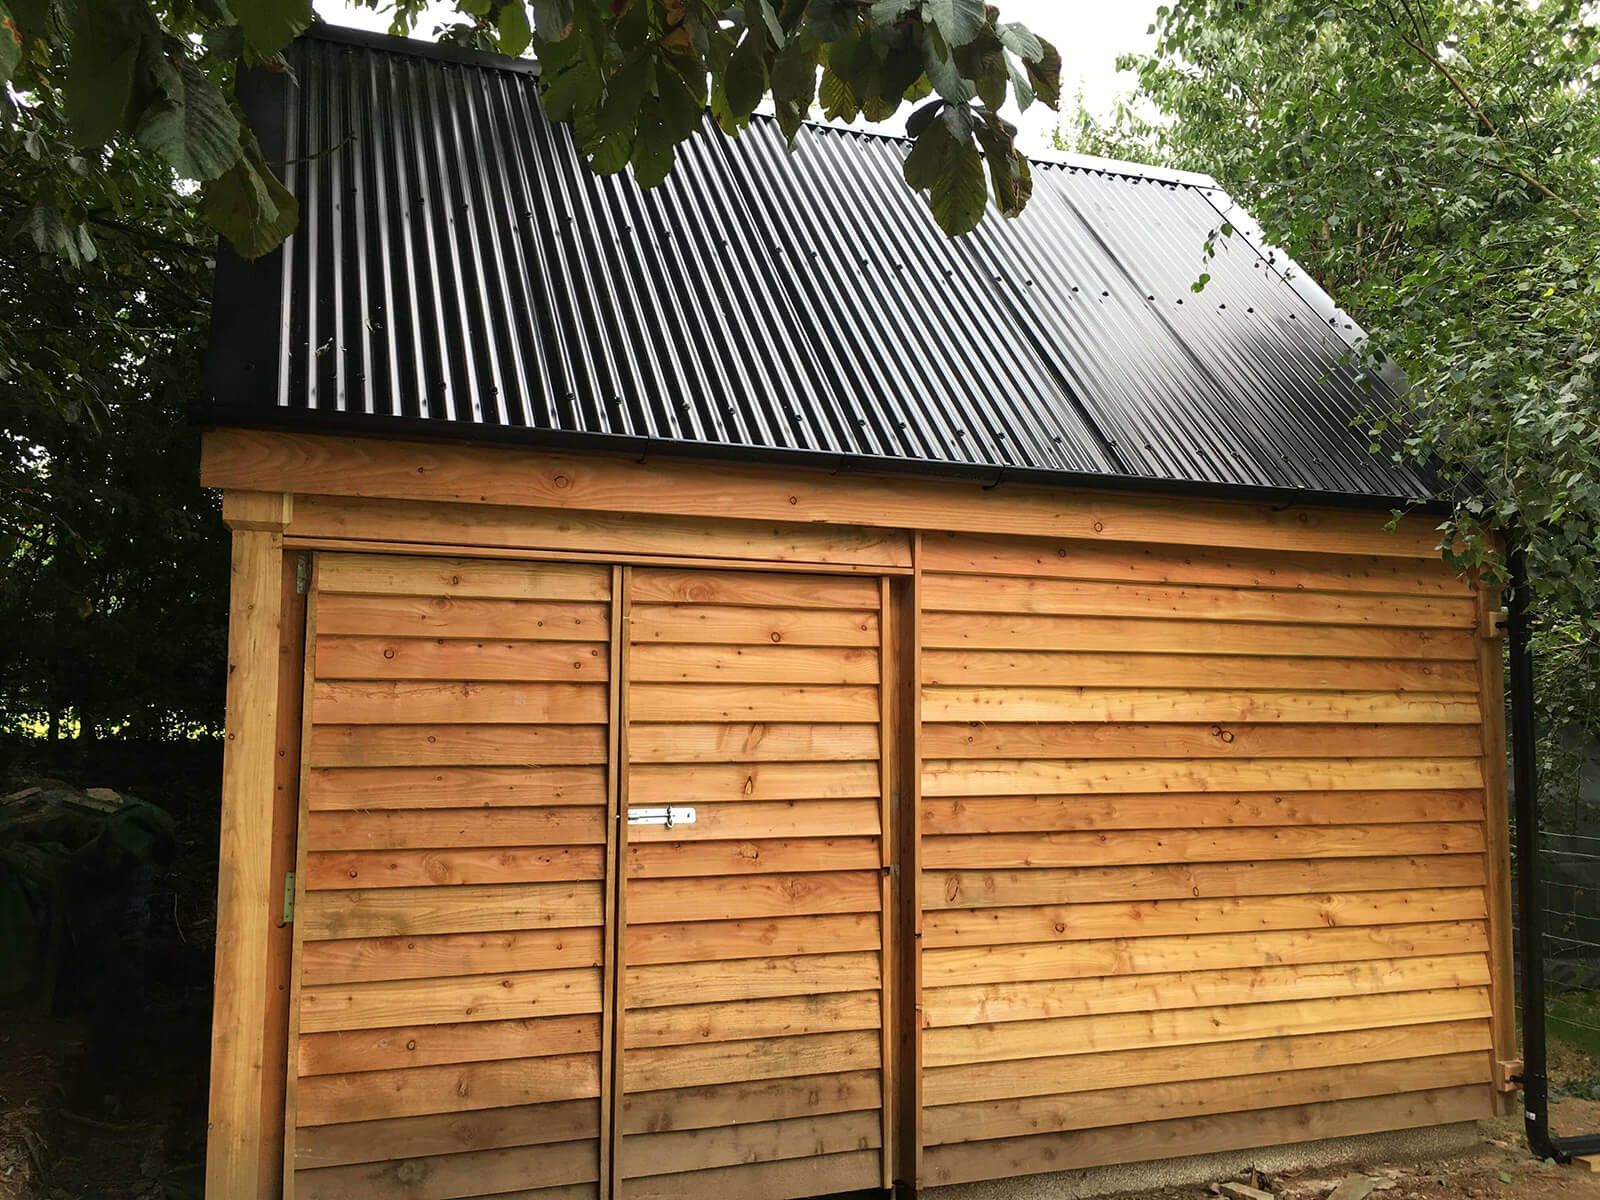 Corrugated Black PVC Roofsheets on Bat Barn